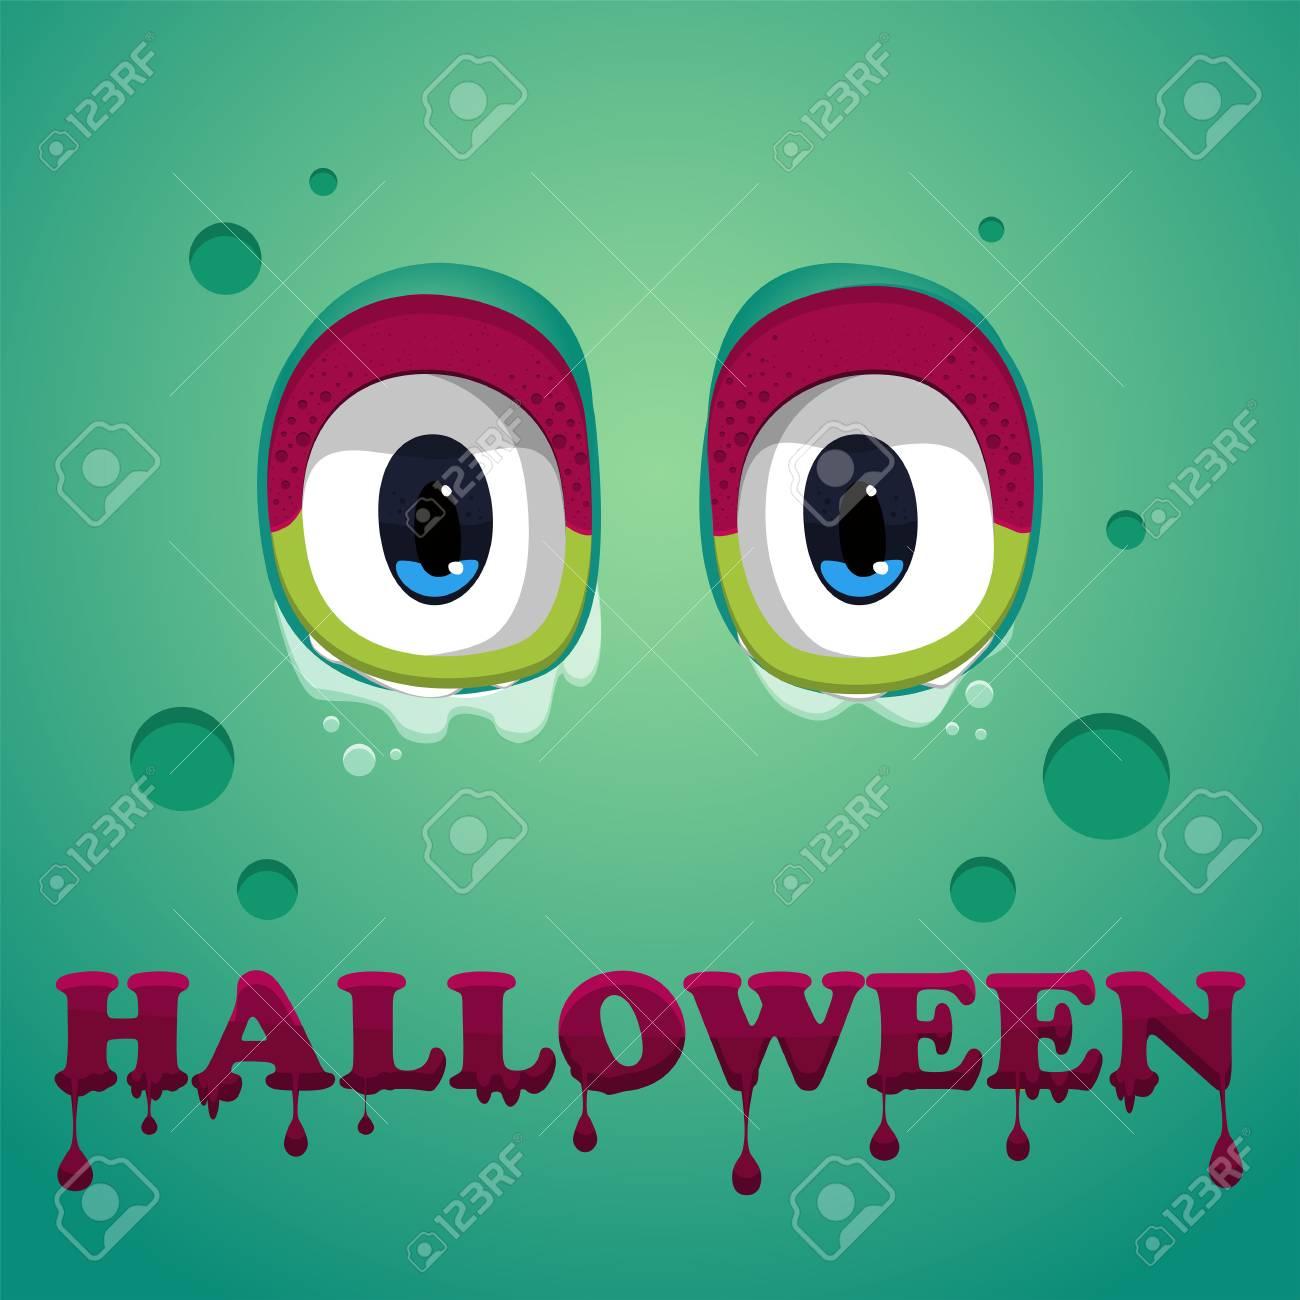 Fundo De Halloween Icone Liso Do Monstro Do Dia Das Bruxas